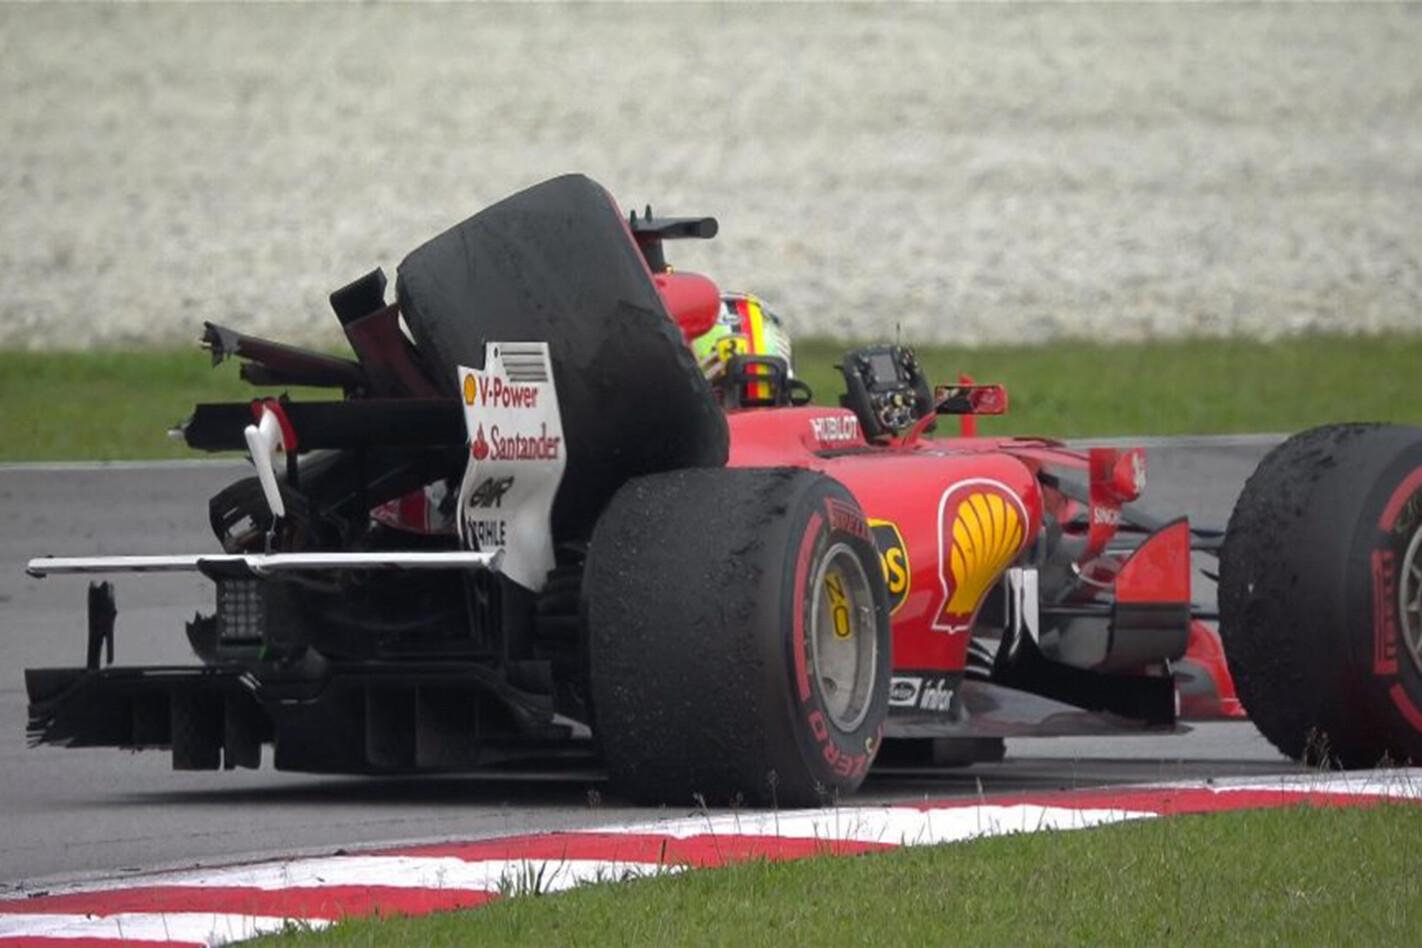 Max Verstappen wins 2017 Malaysian Grand Prix